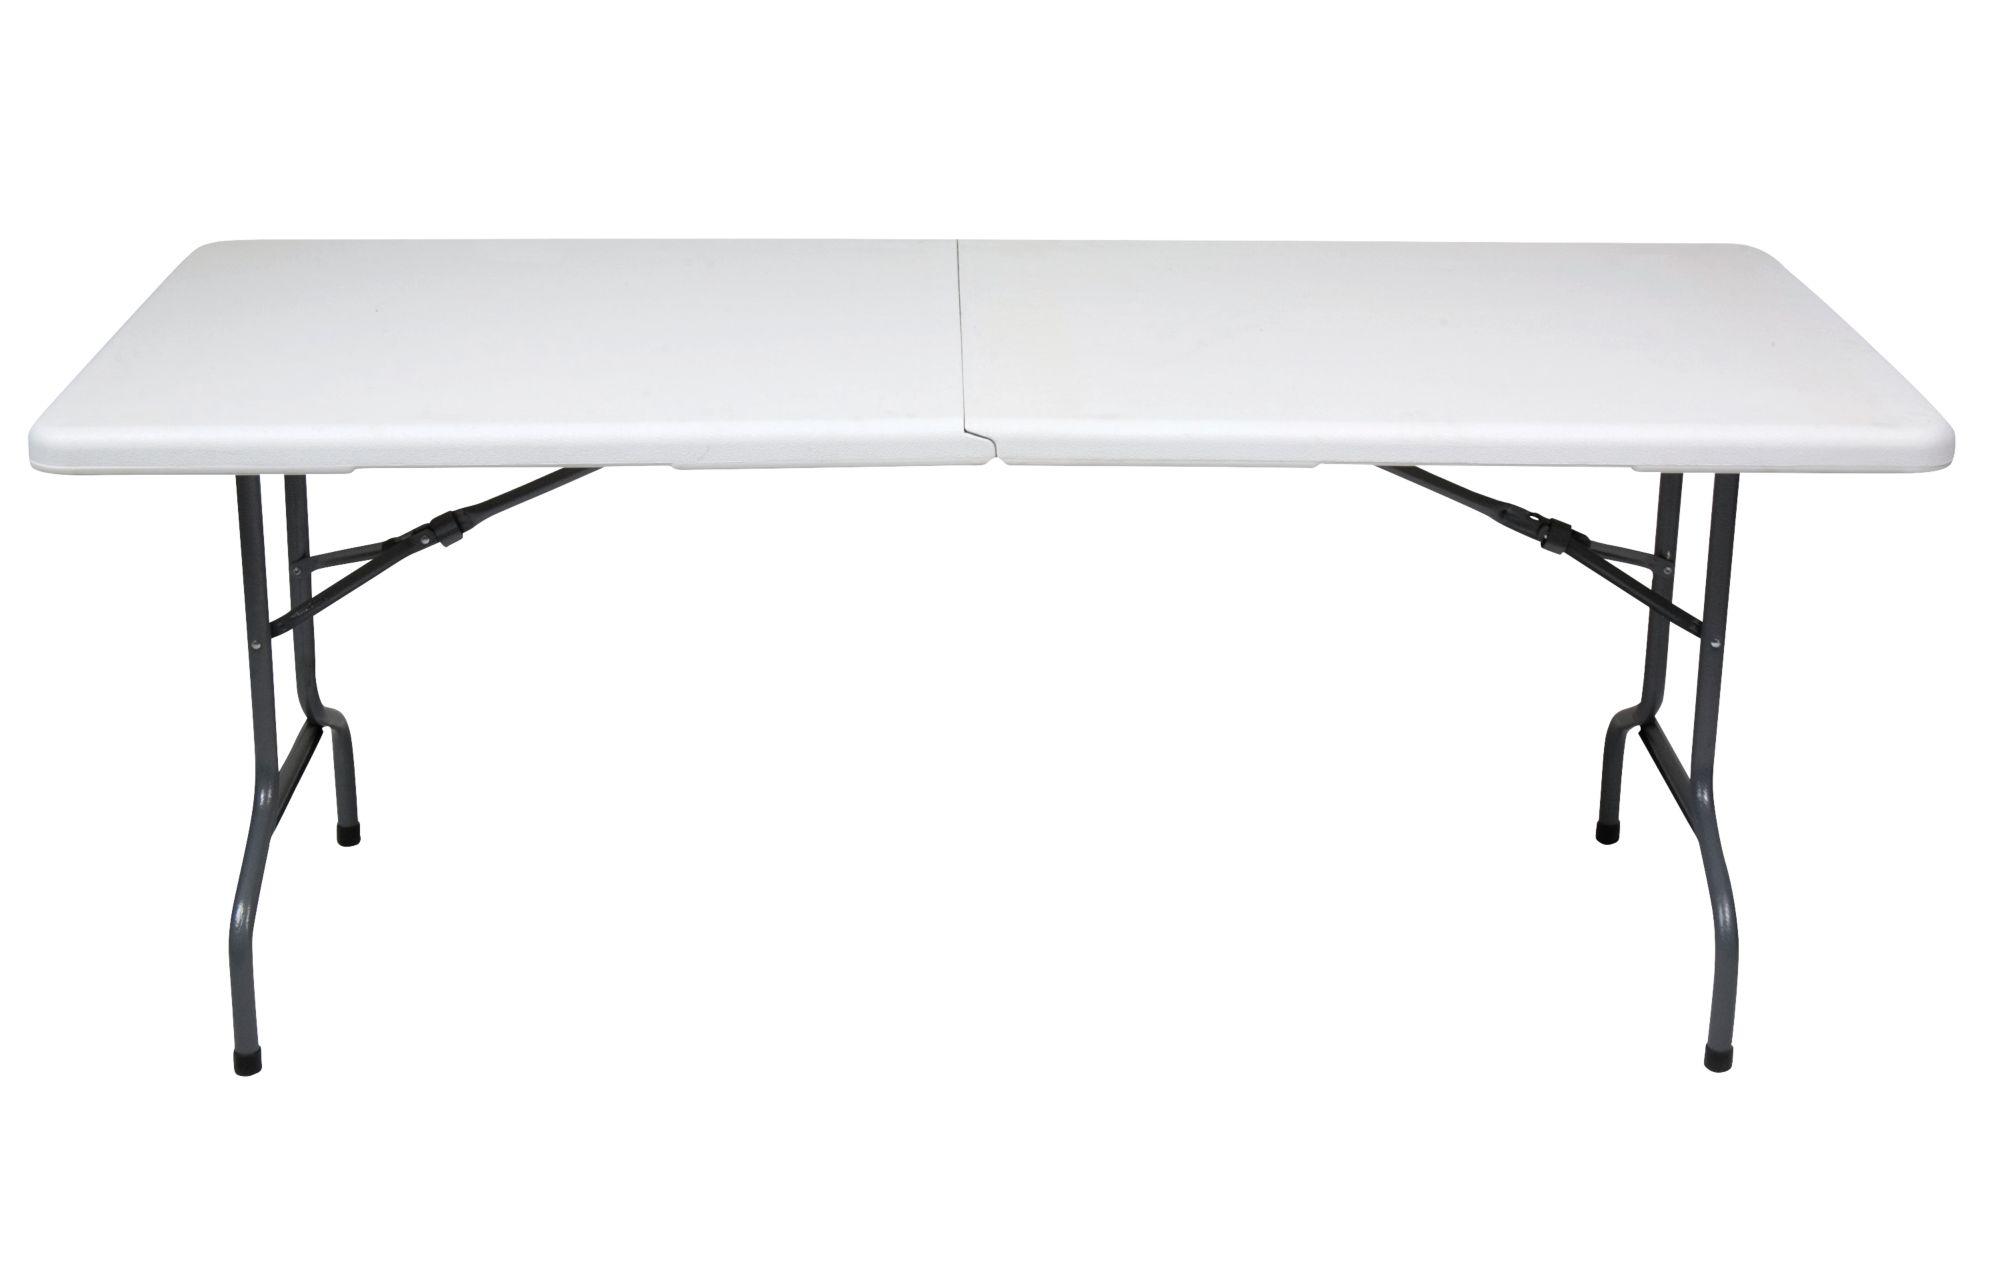 Enduro 5 Ft. Center Folding Table 1